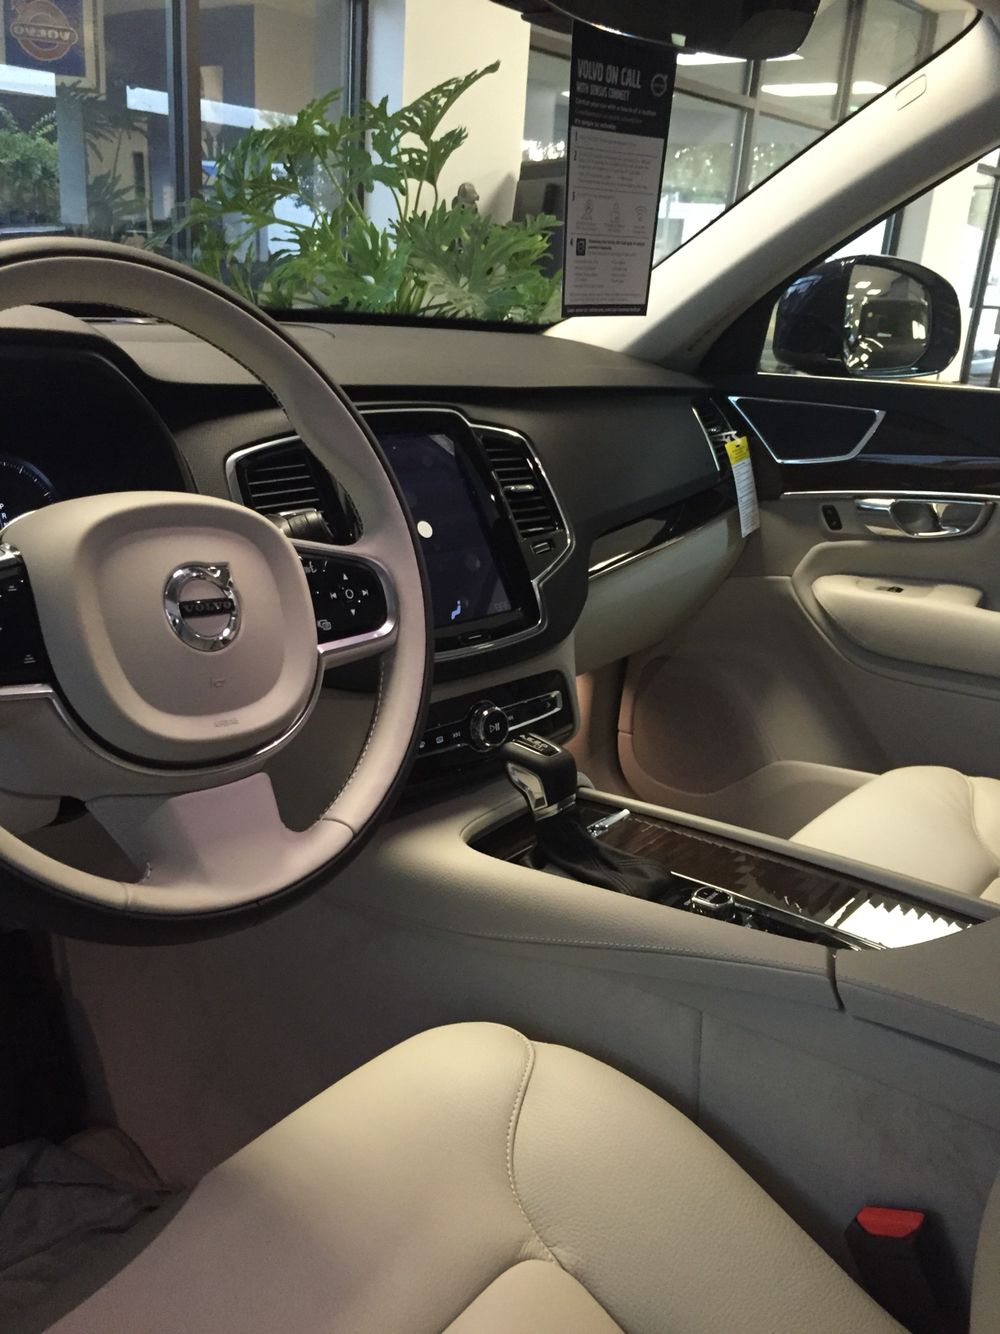 Blonde Momentum interior Volvo XC90 2016 | Autos | Pinterest